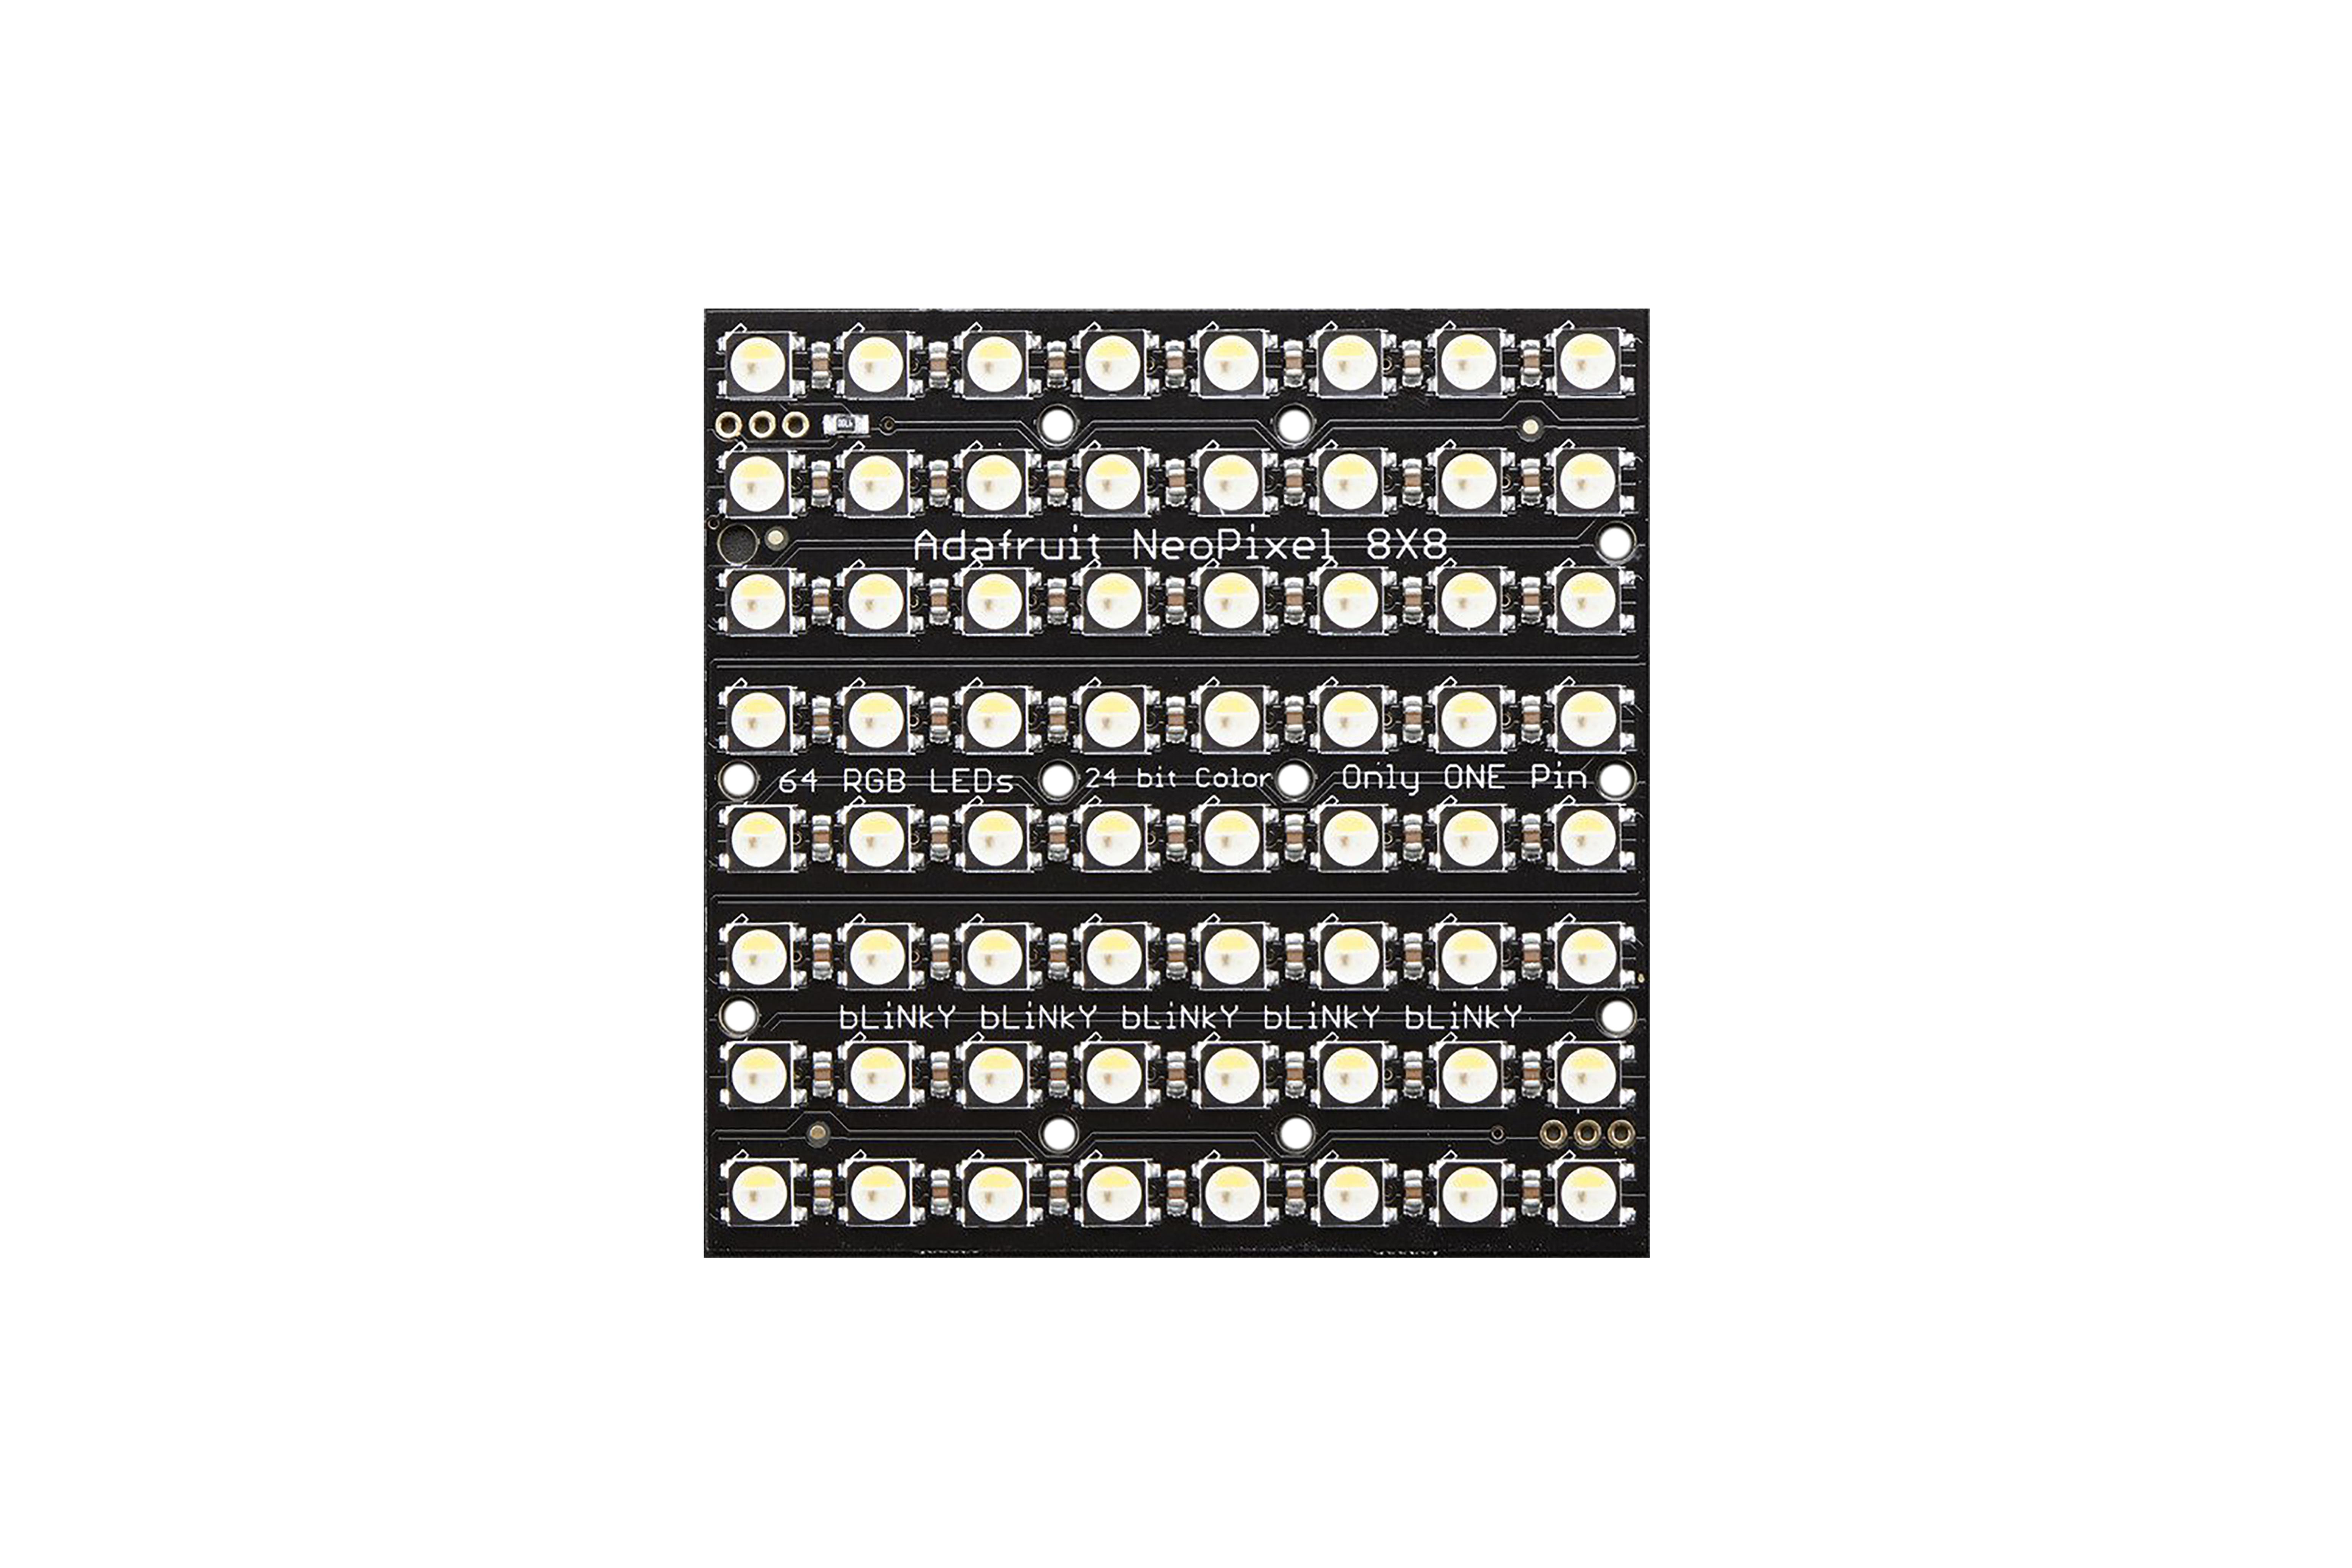 NEOPIXEL NEOMATRIX 64 RGBW LED 4500K